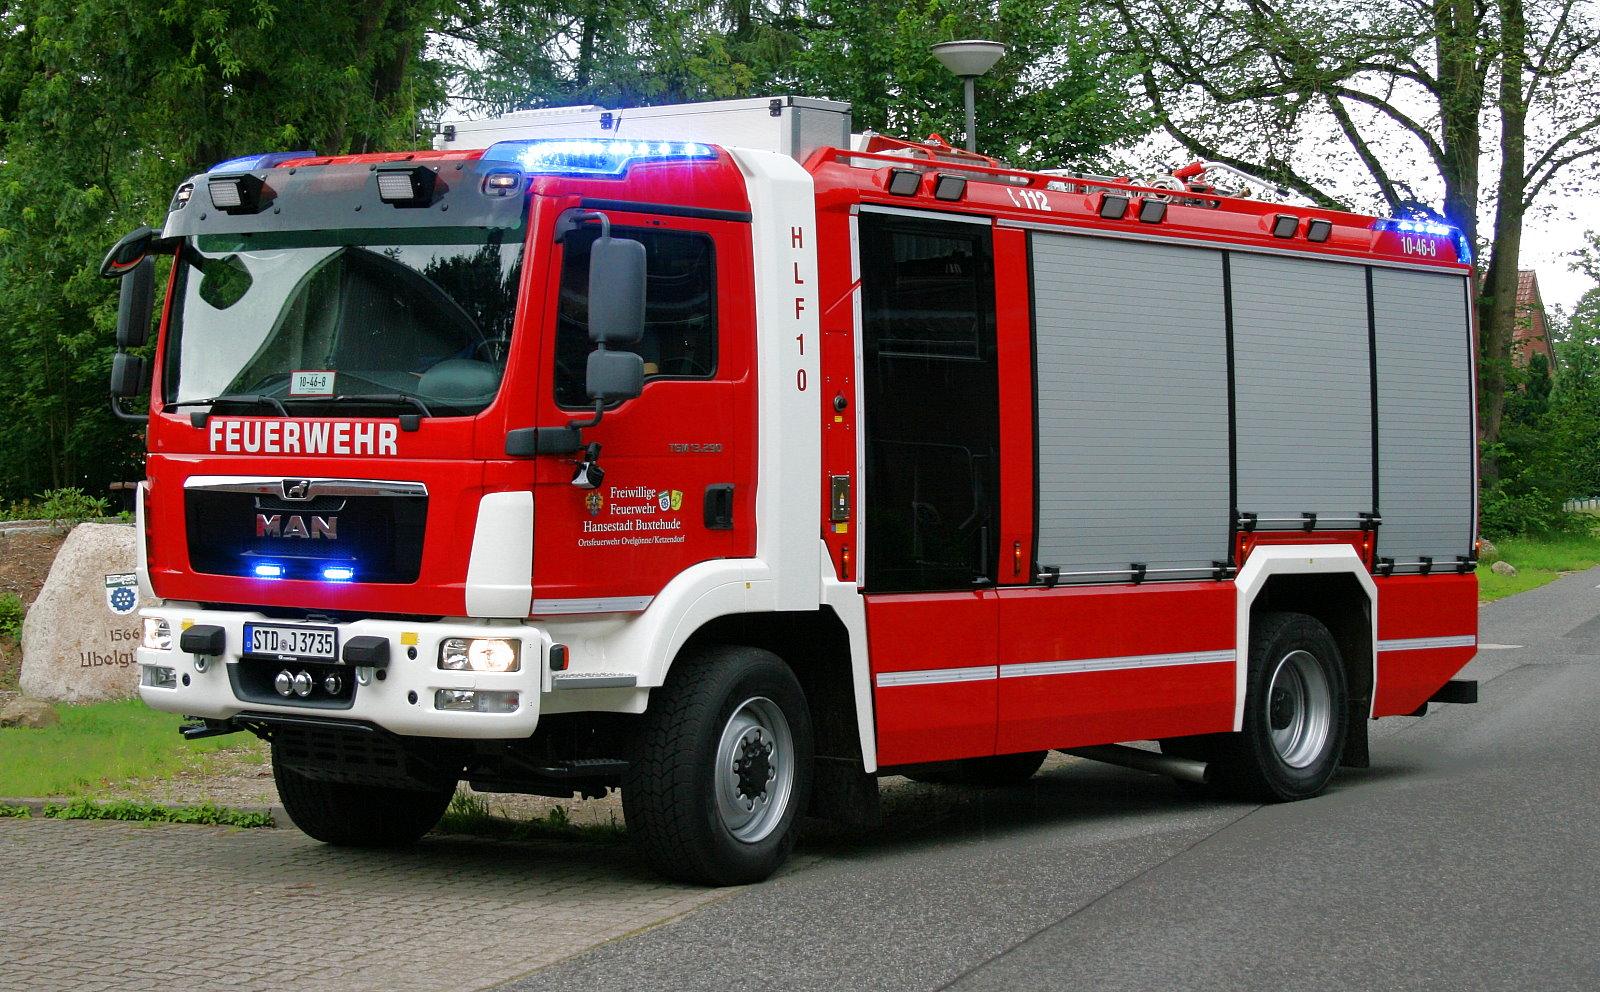 http://feuerwehr-buxtehude.de/media/img/bilder_ow_ov/bilder_ov_fa/hlf/02.JPG